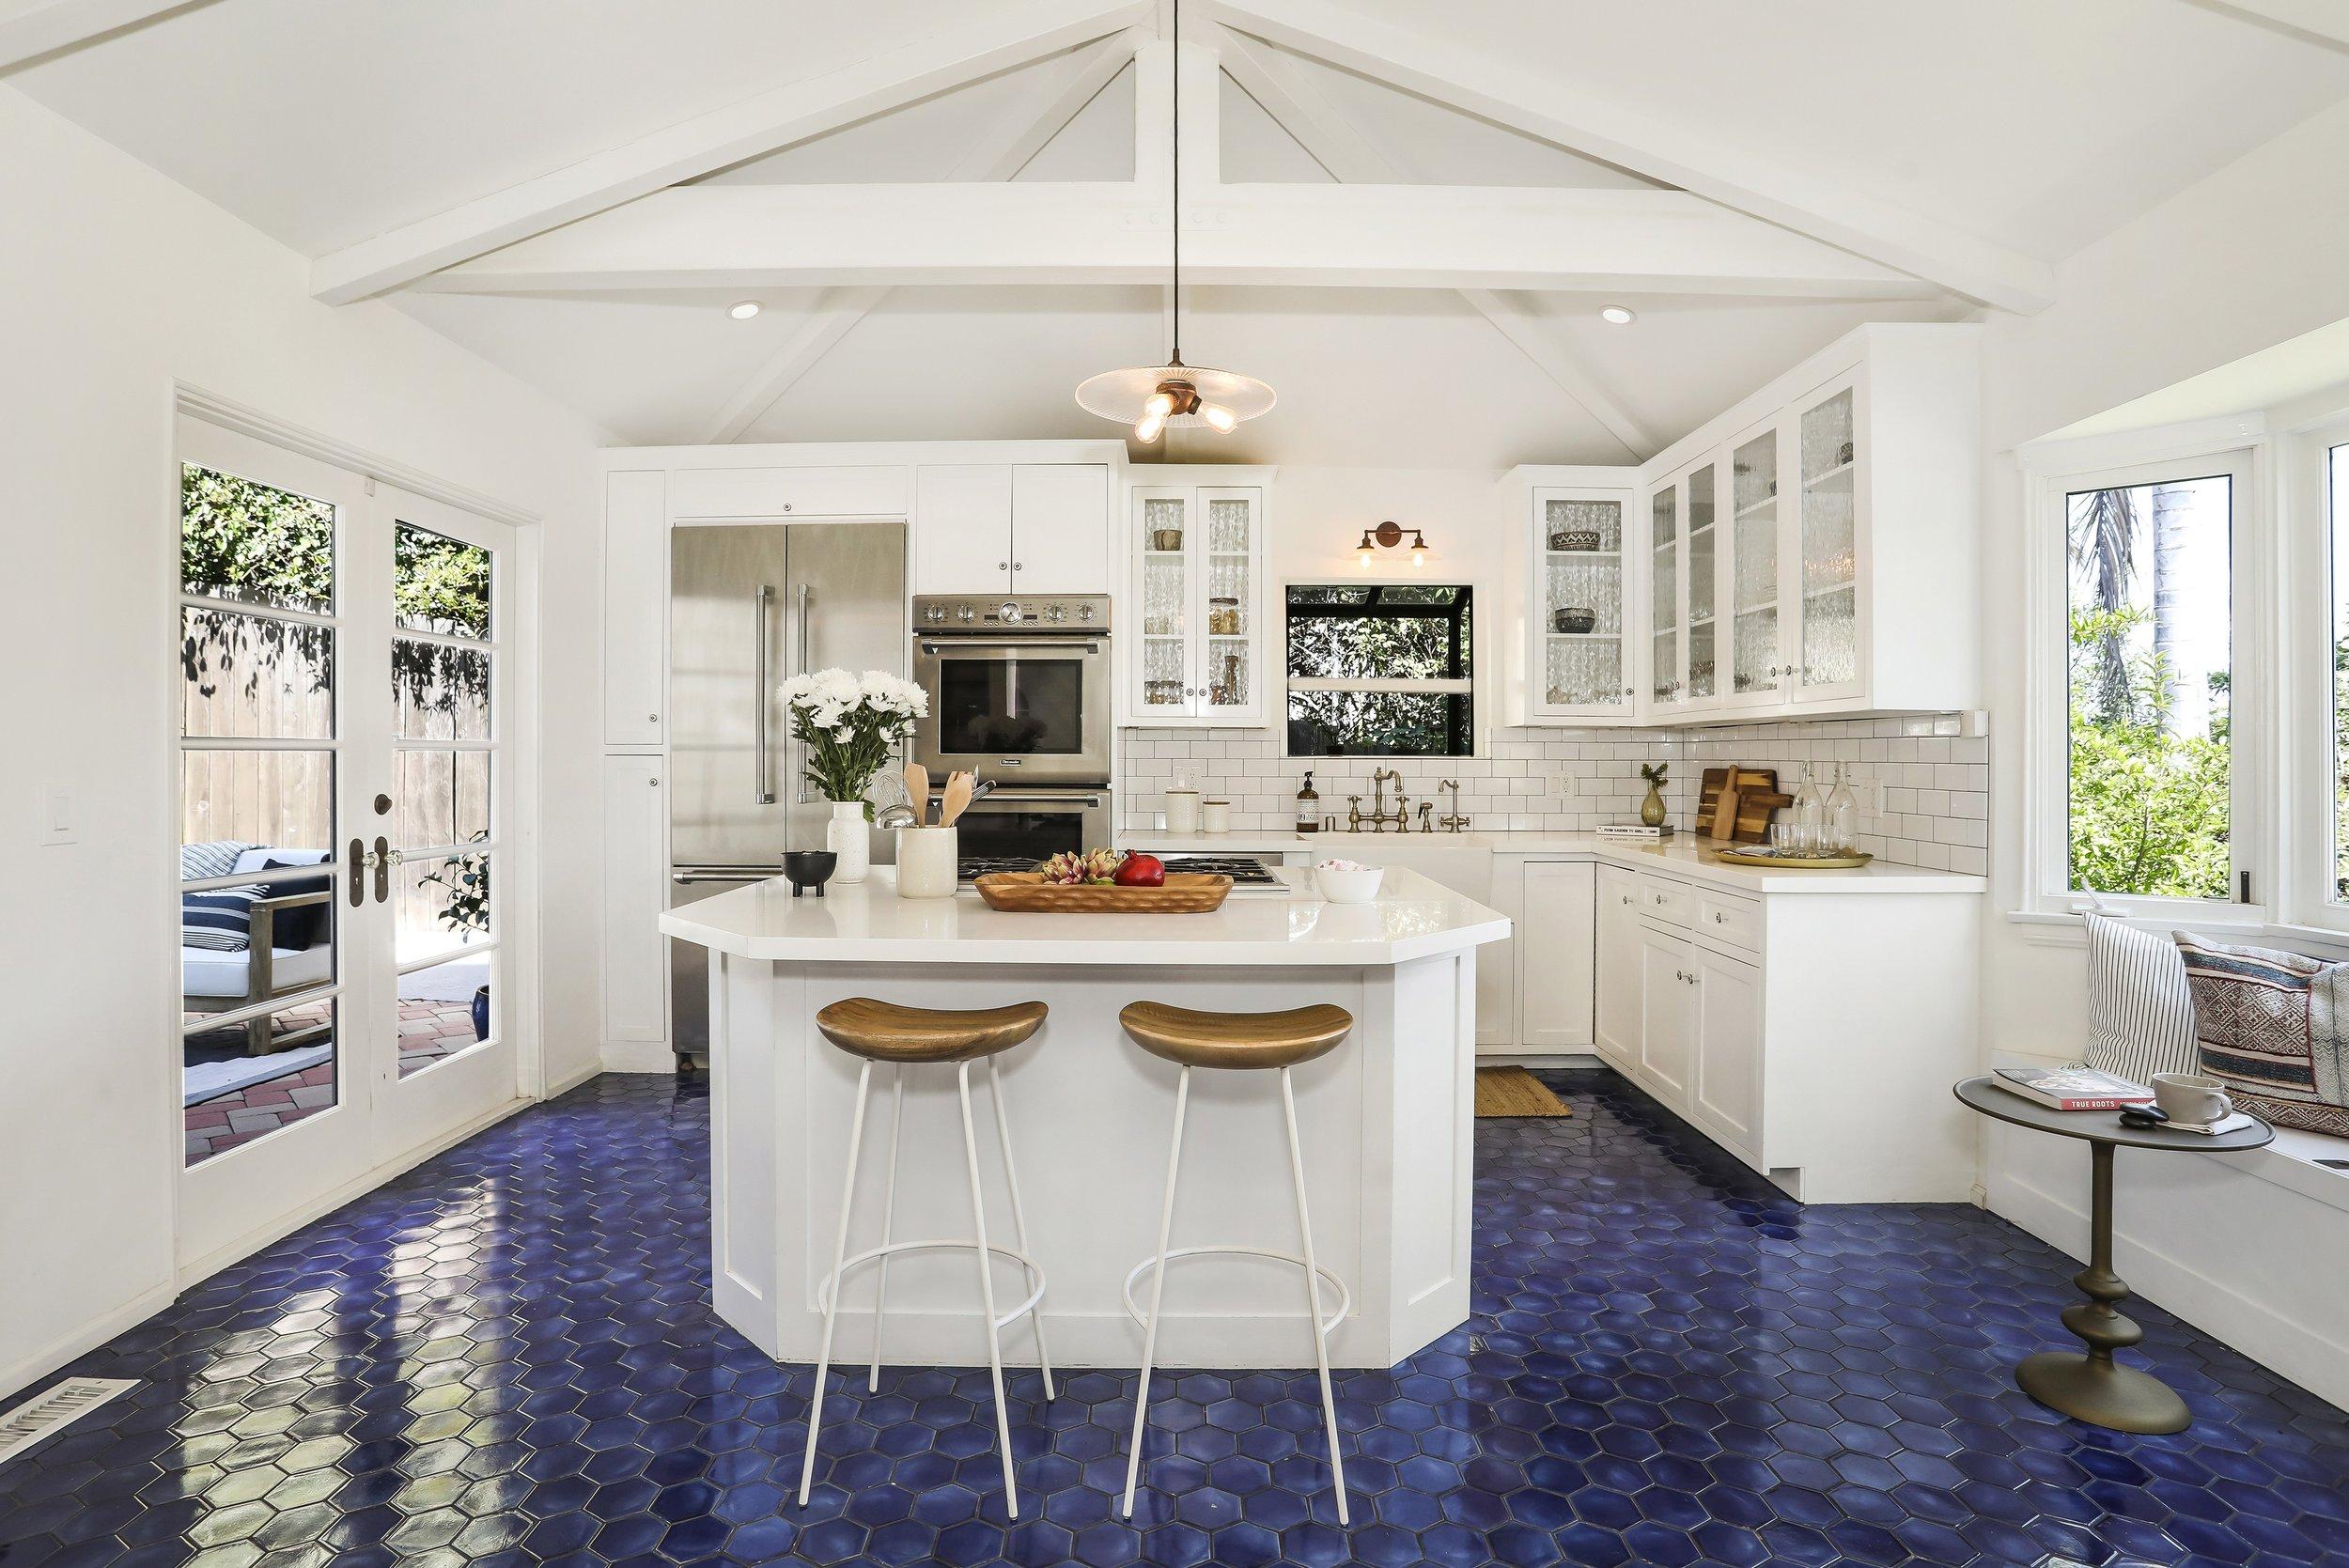 PEOPLE - Disney Star Bridgit Mendler Lists Los Angeles Lake-View Home for $2 MillionPeople - September 20, 2019